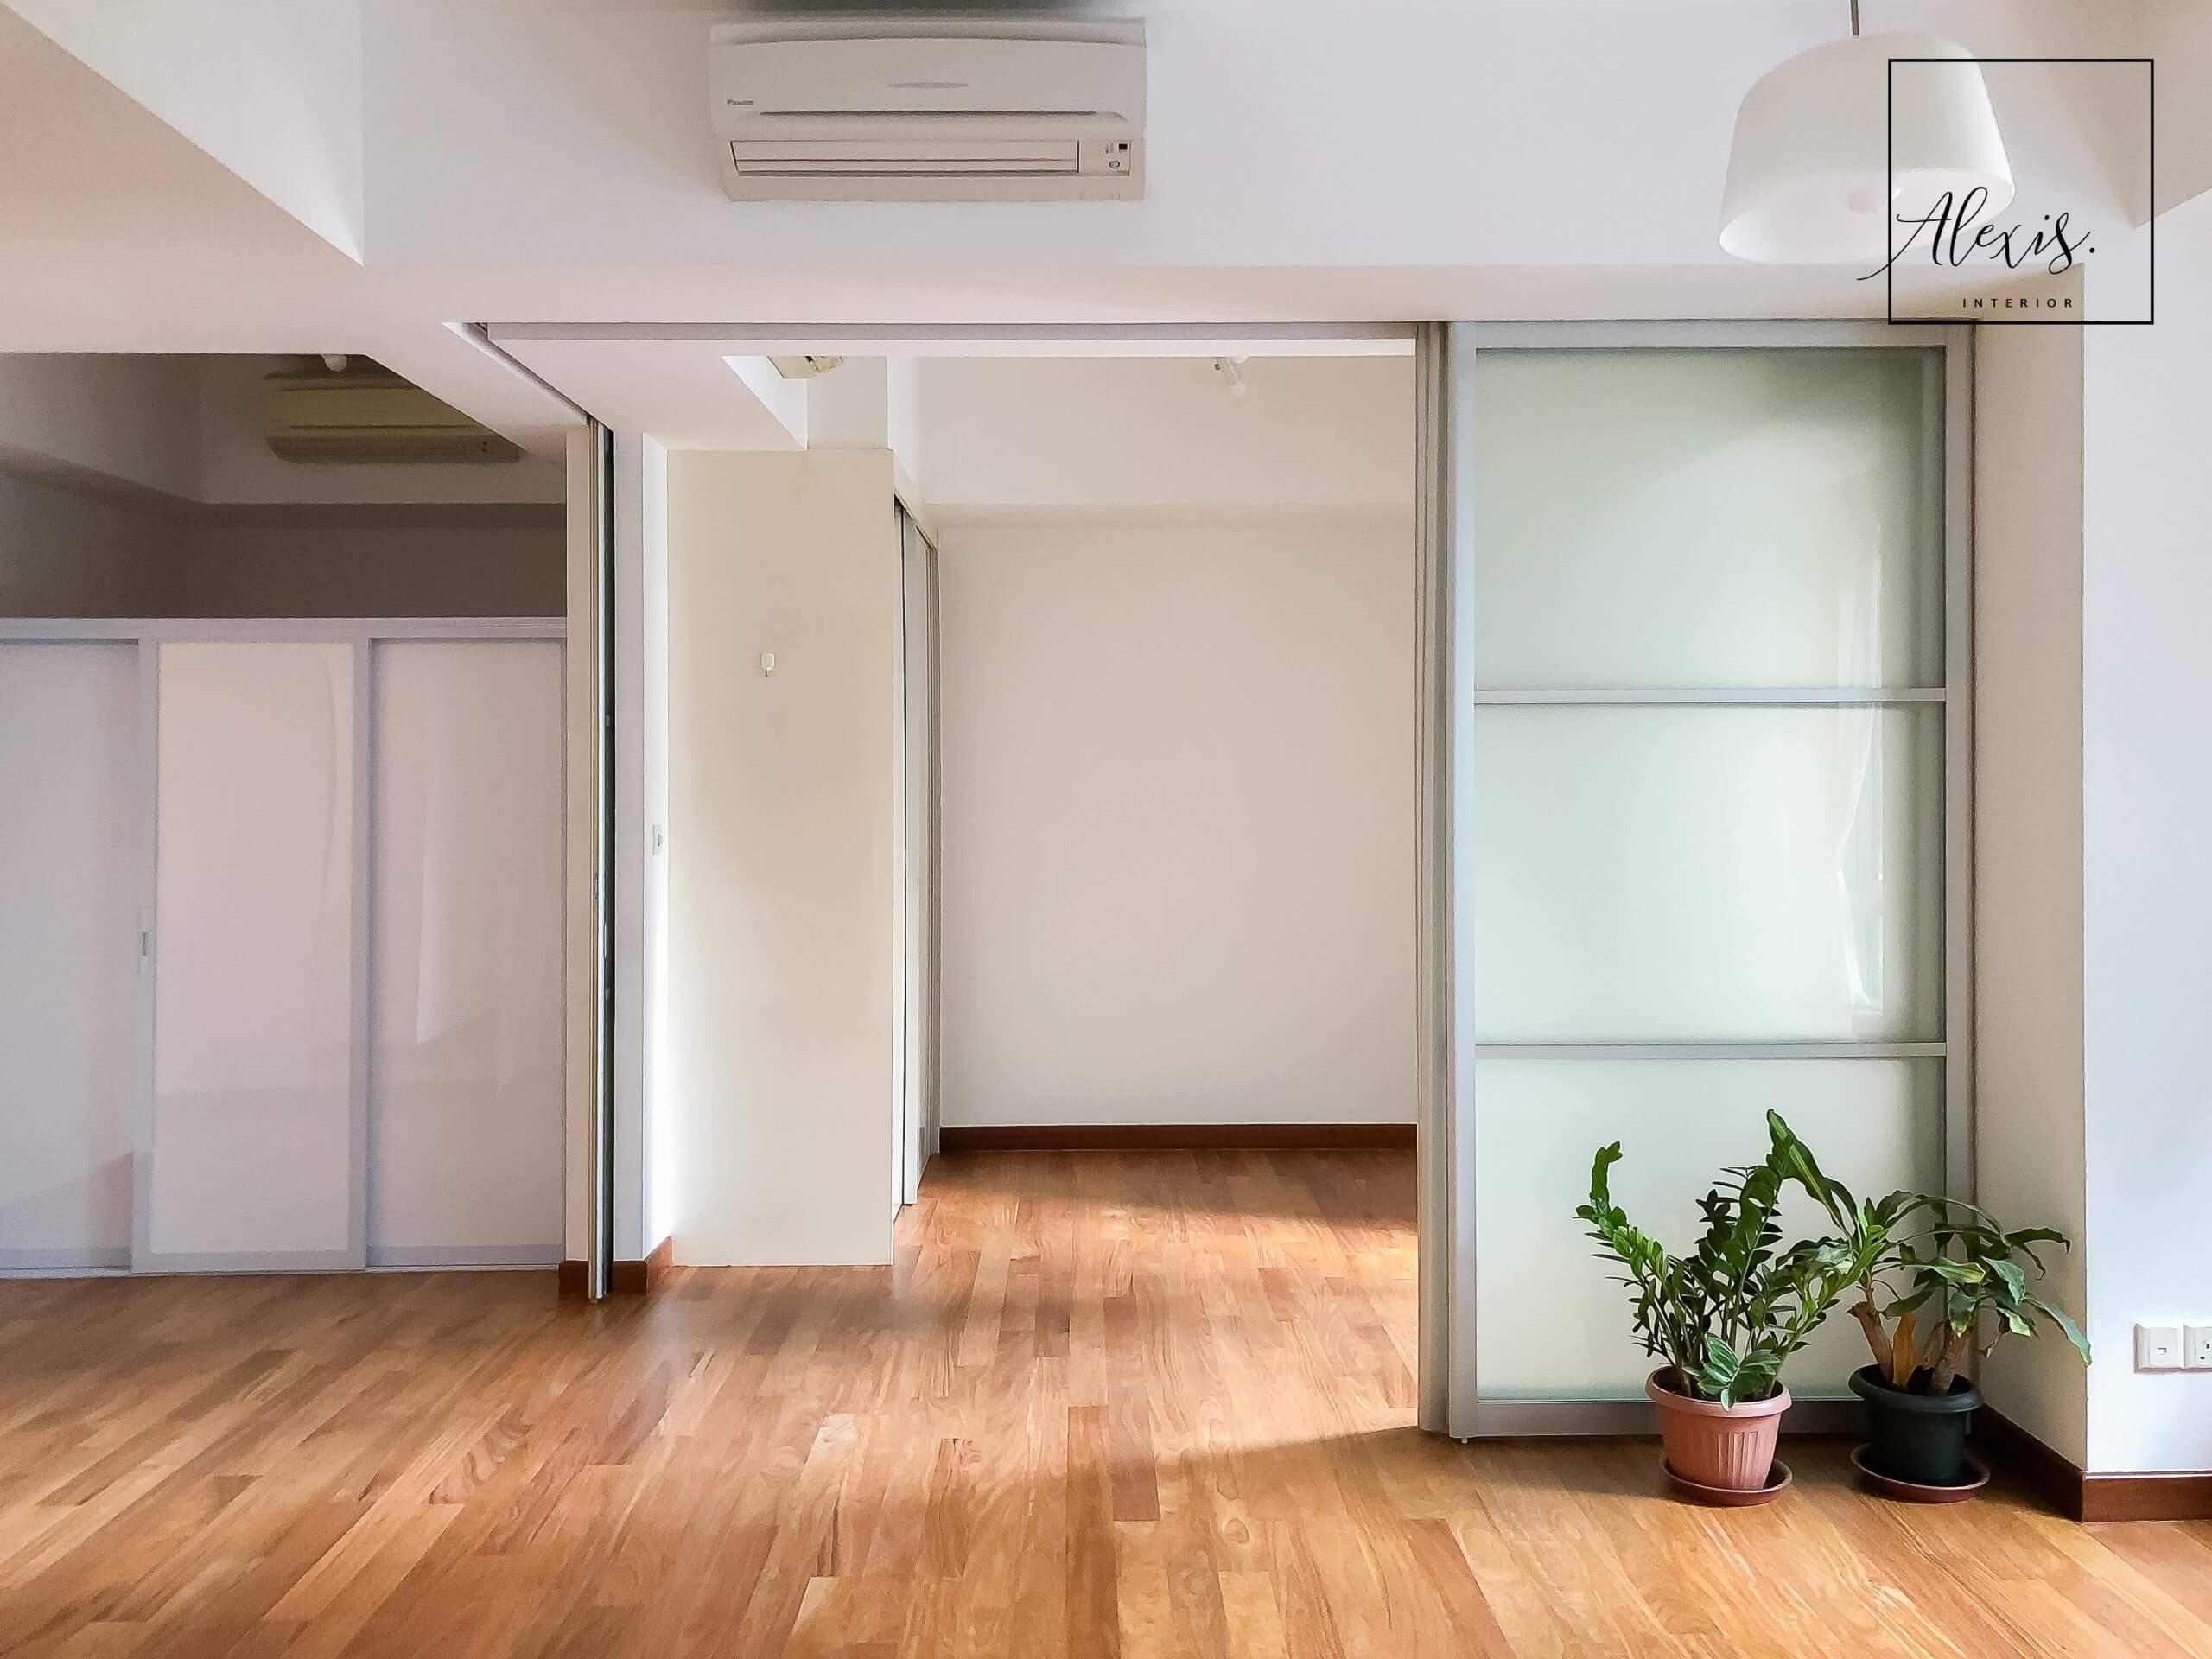 The Sail @ Marina Bay Scandinavian living area with plants and sliding doors.